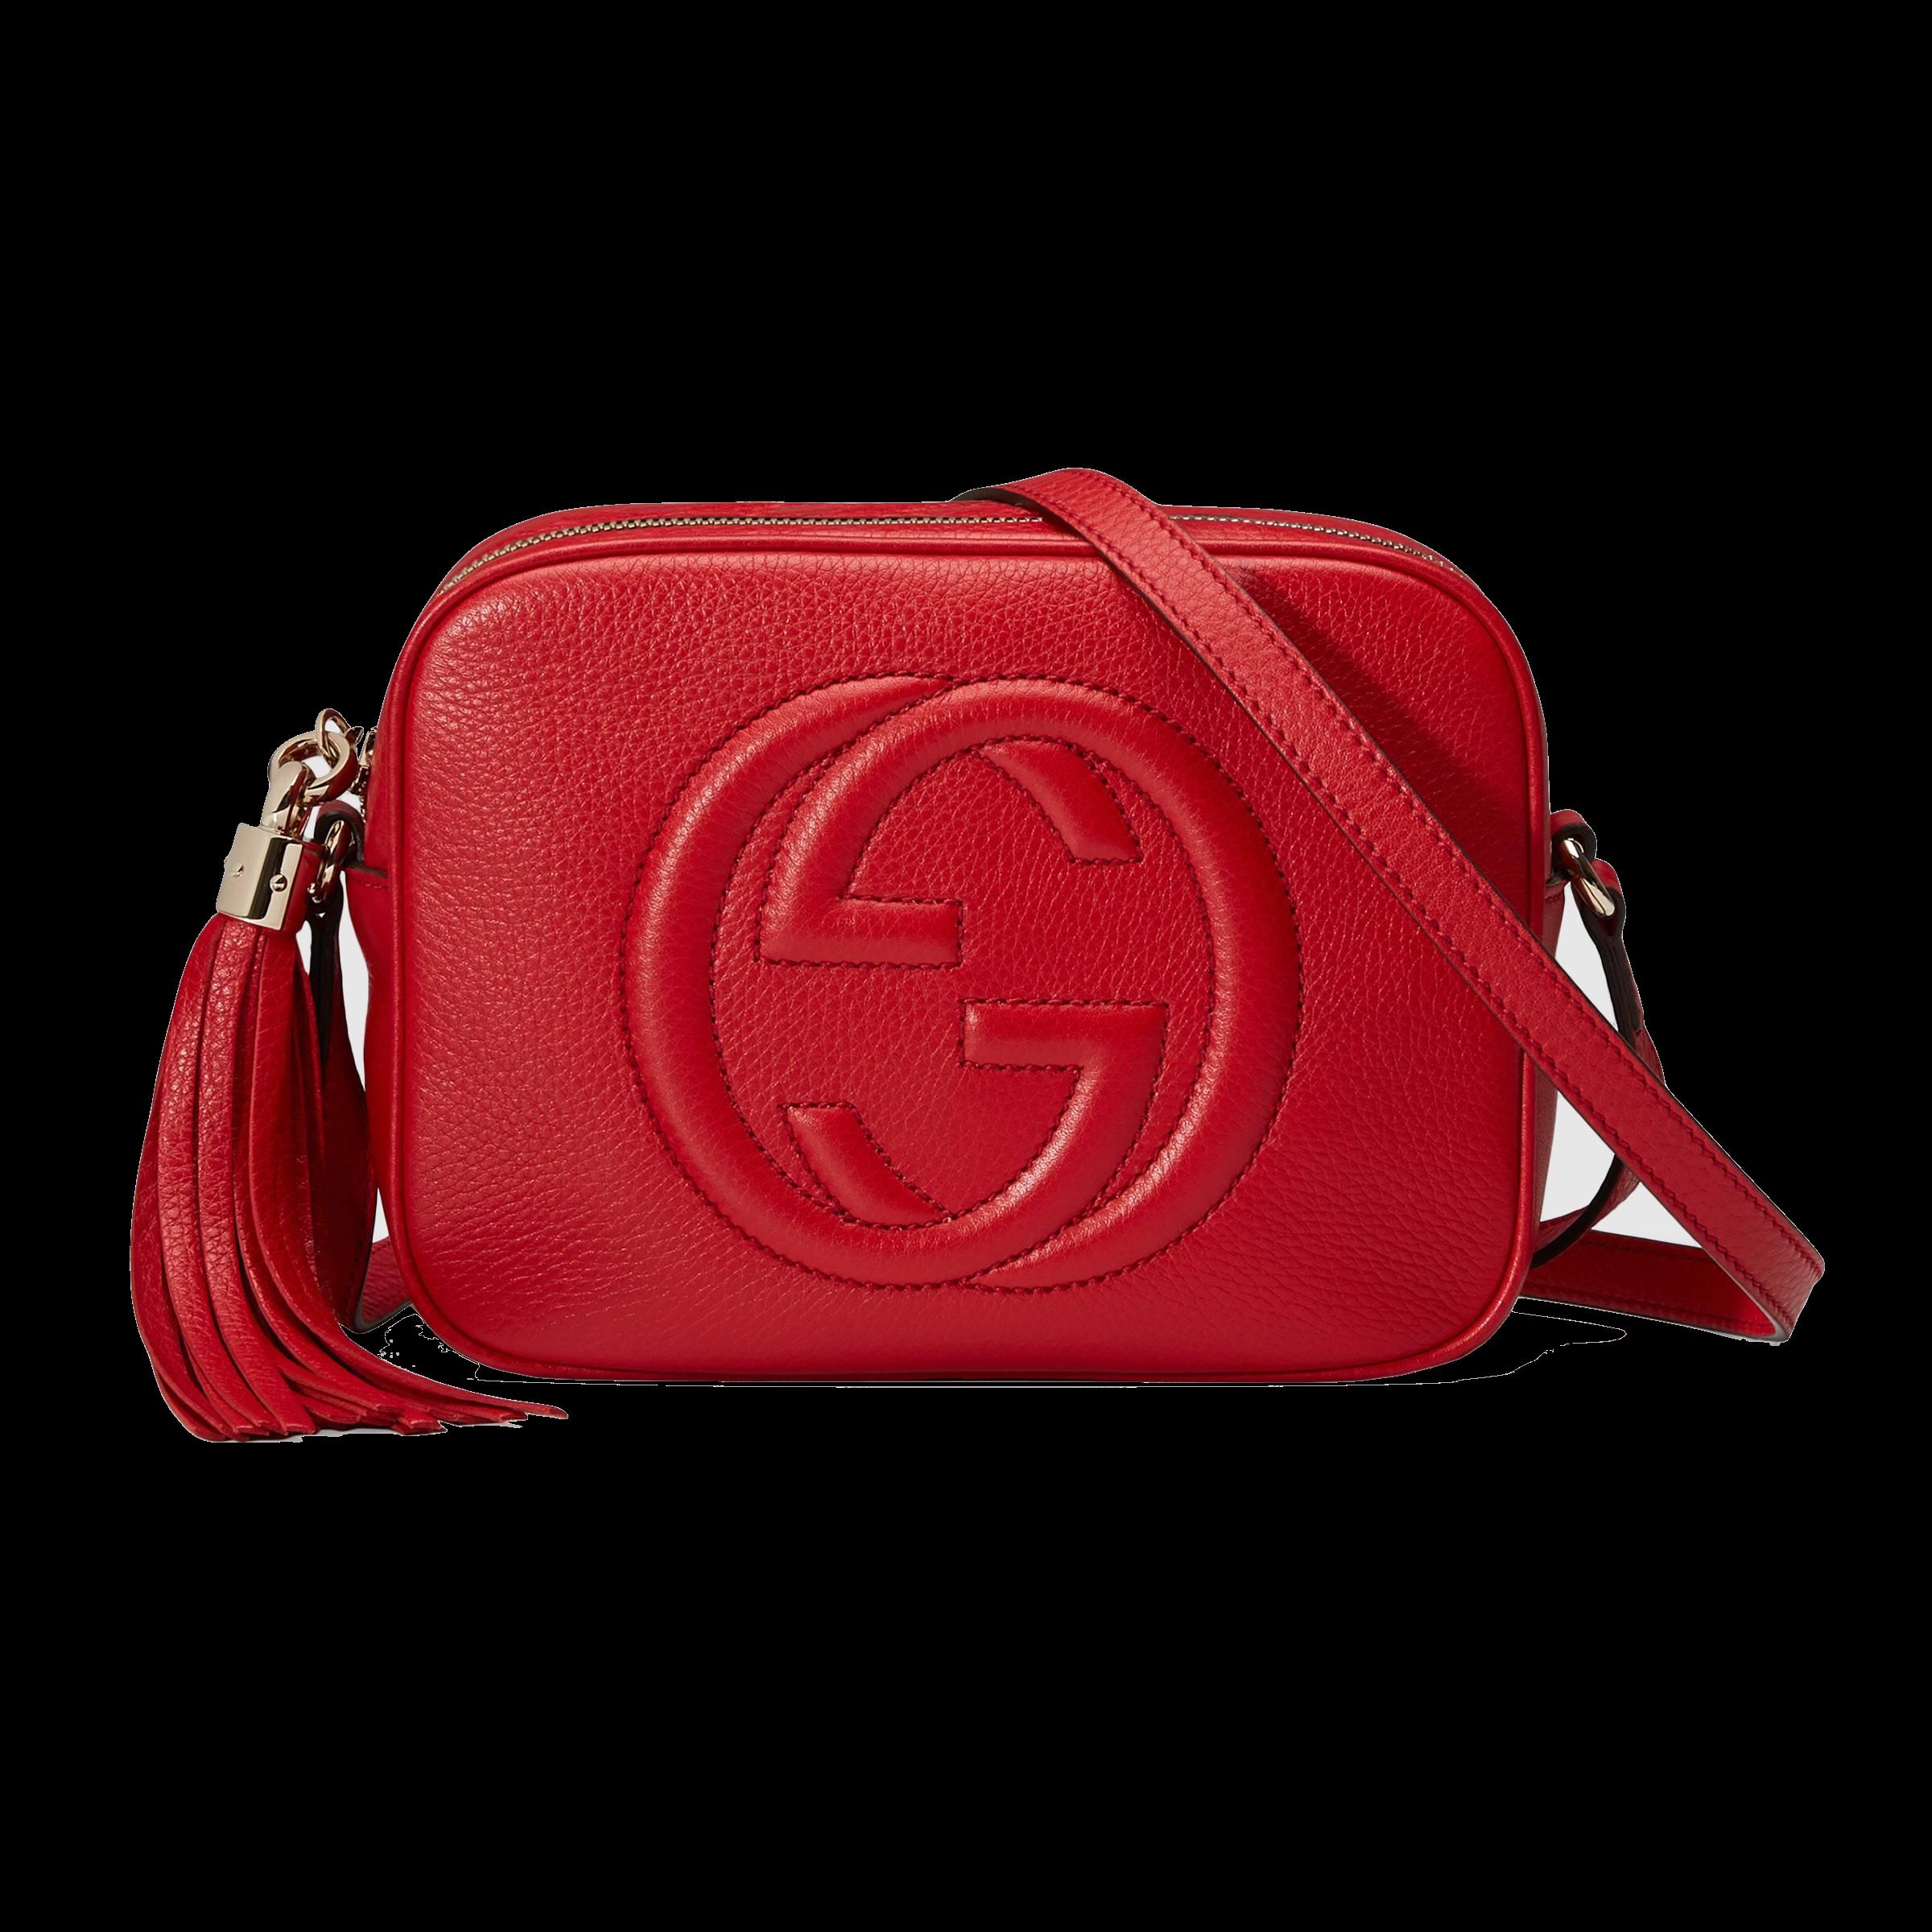 db9fdc5a9 Gucci shoulder bag red www.thegoodbags.com MICHAEL Michael Kors Handbag,  Jet Set Travel Large Messenger Bag - Shop All -$67